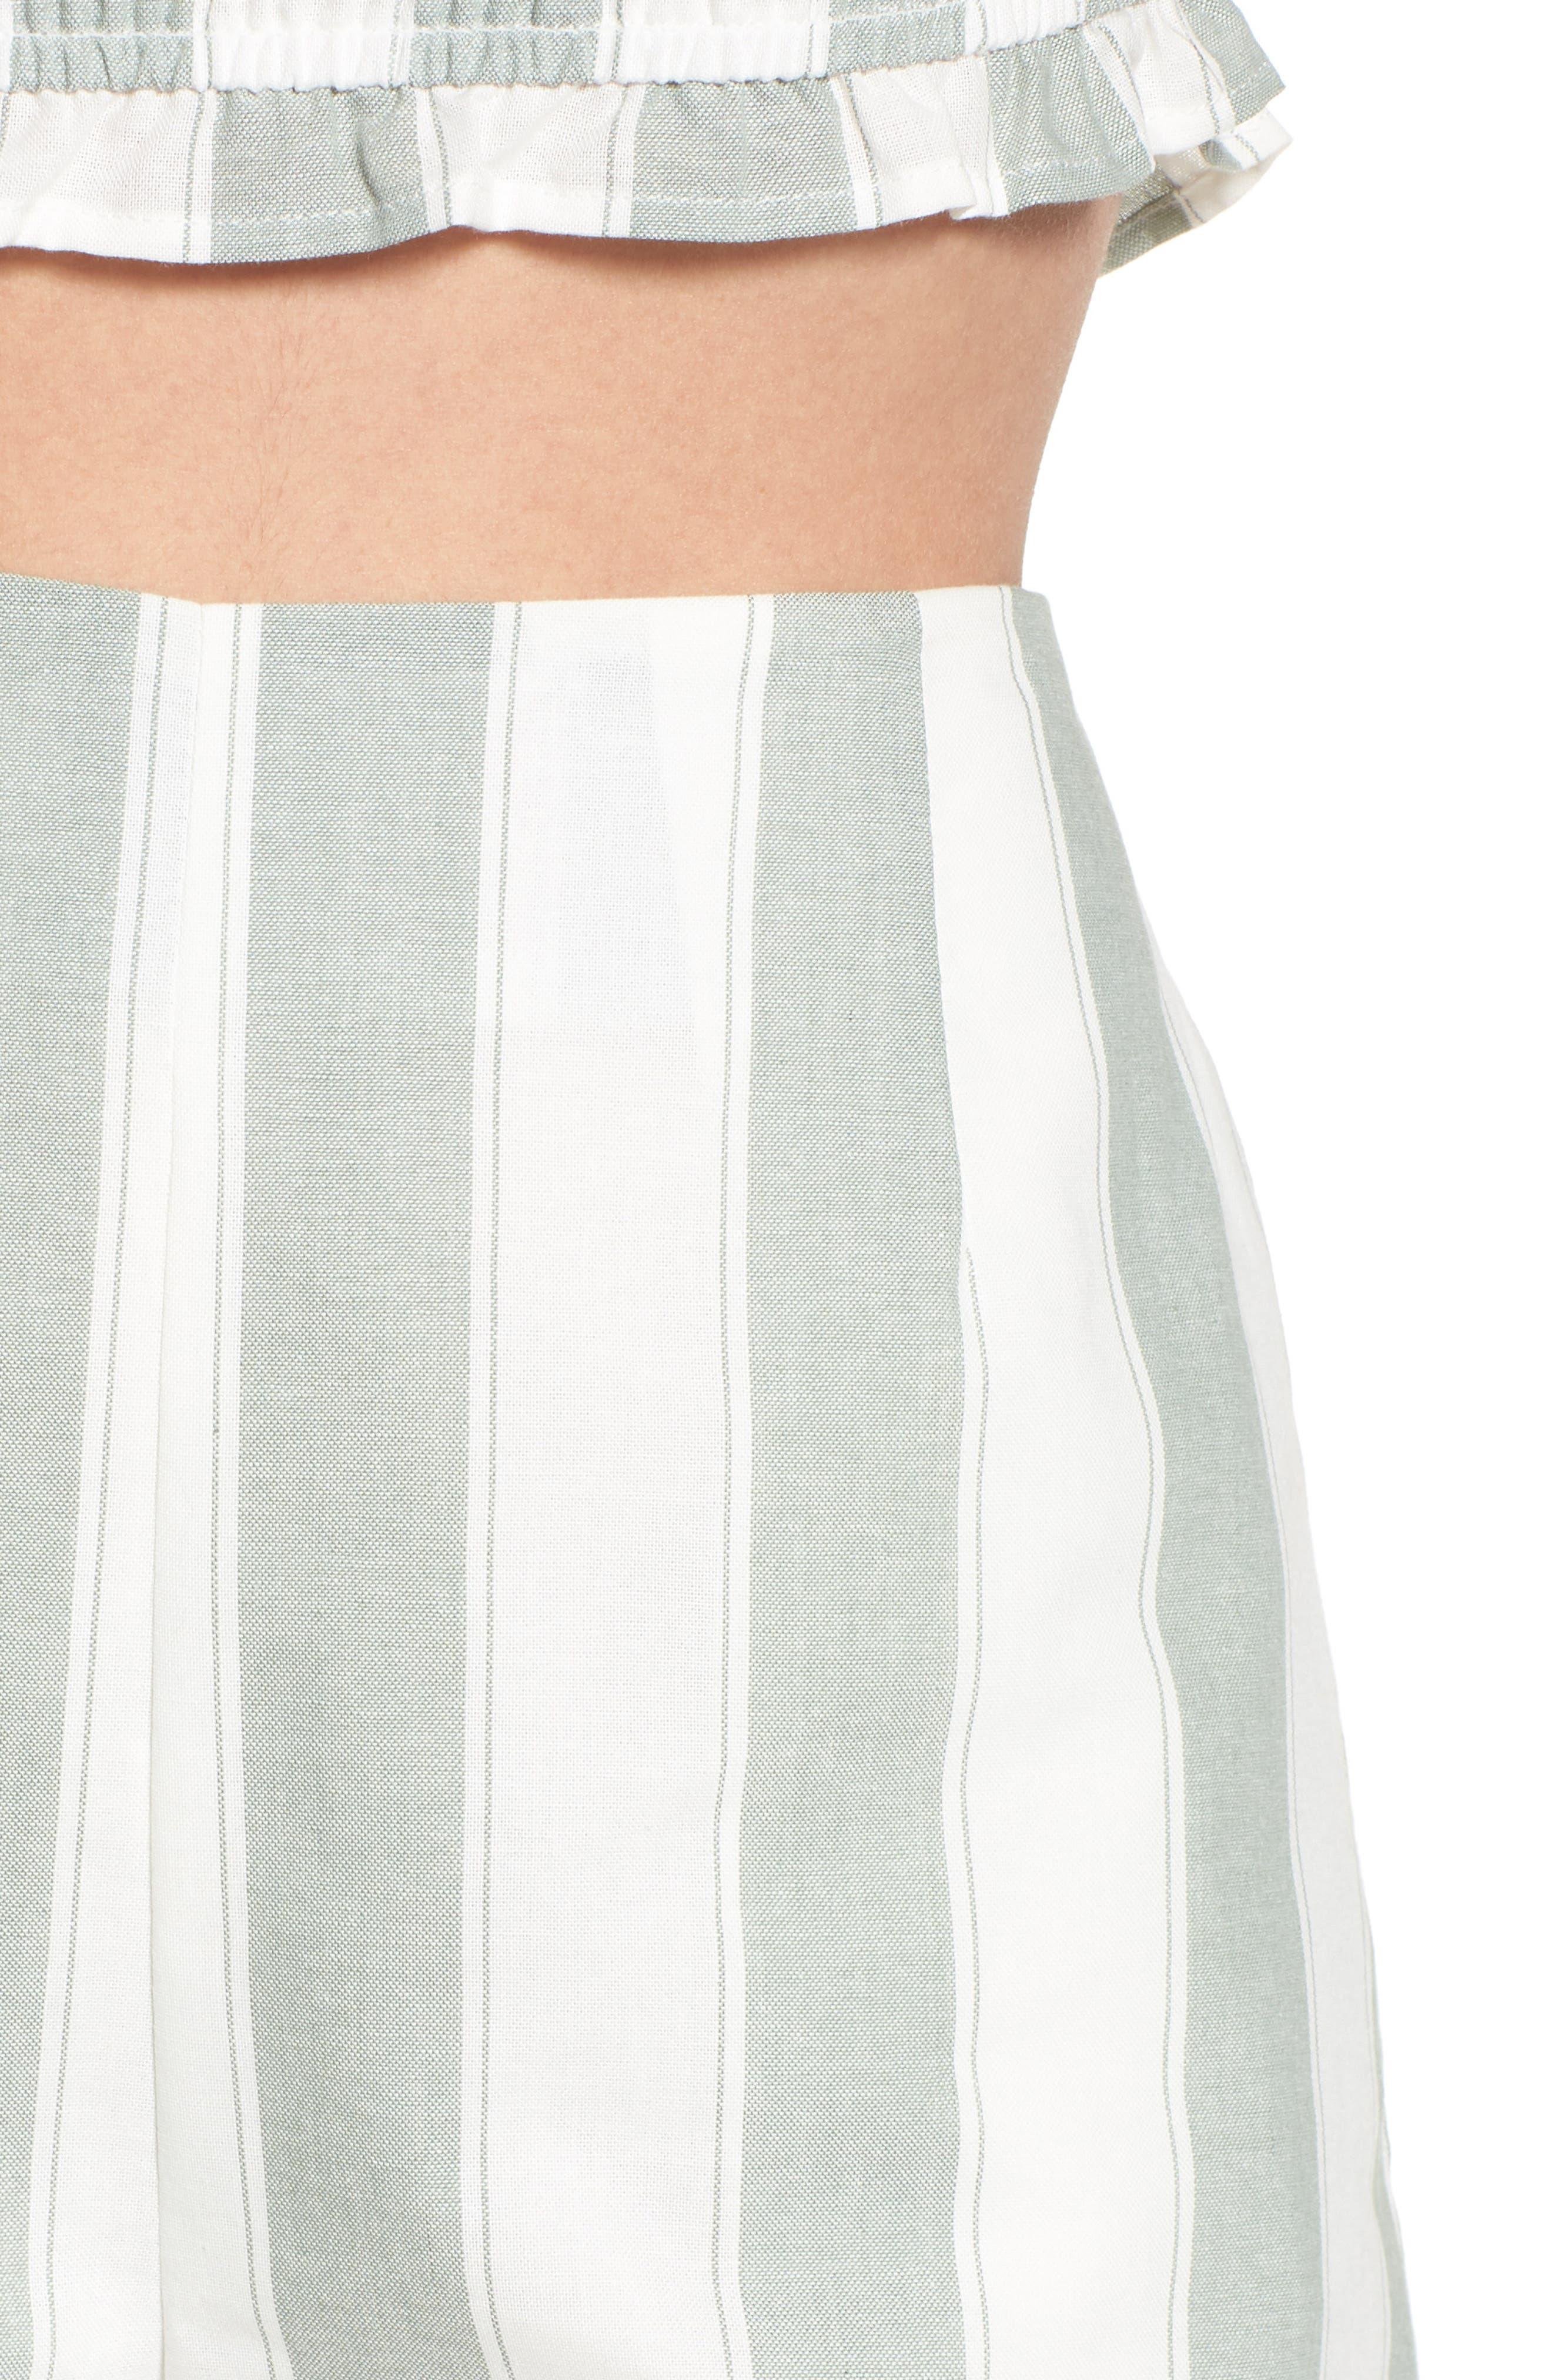 Poetic Stripe Shorts,                             Alternate thumbnail 4, color,                             105